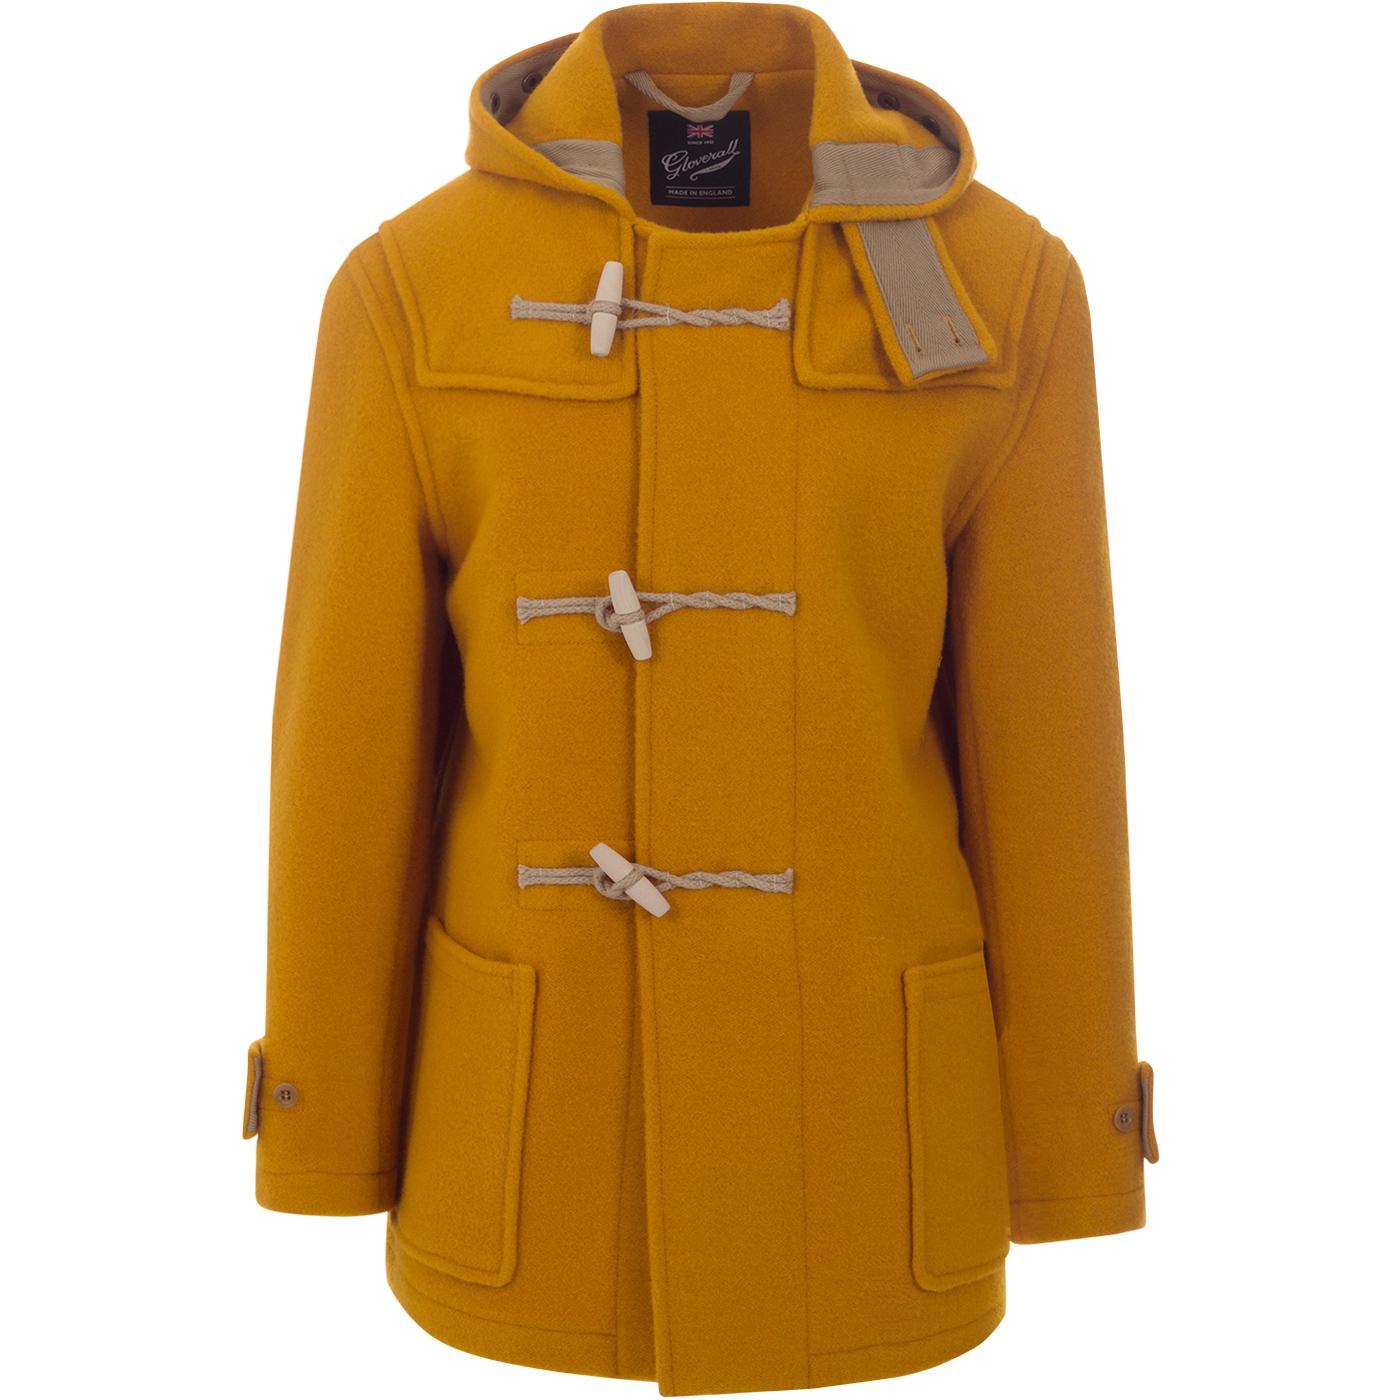 Mid Monty GLOVERALL Mod 60s Wool Duffle Coat (Y)